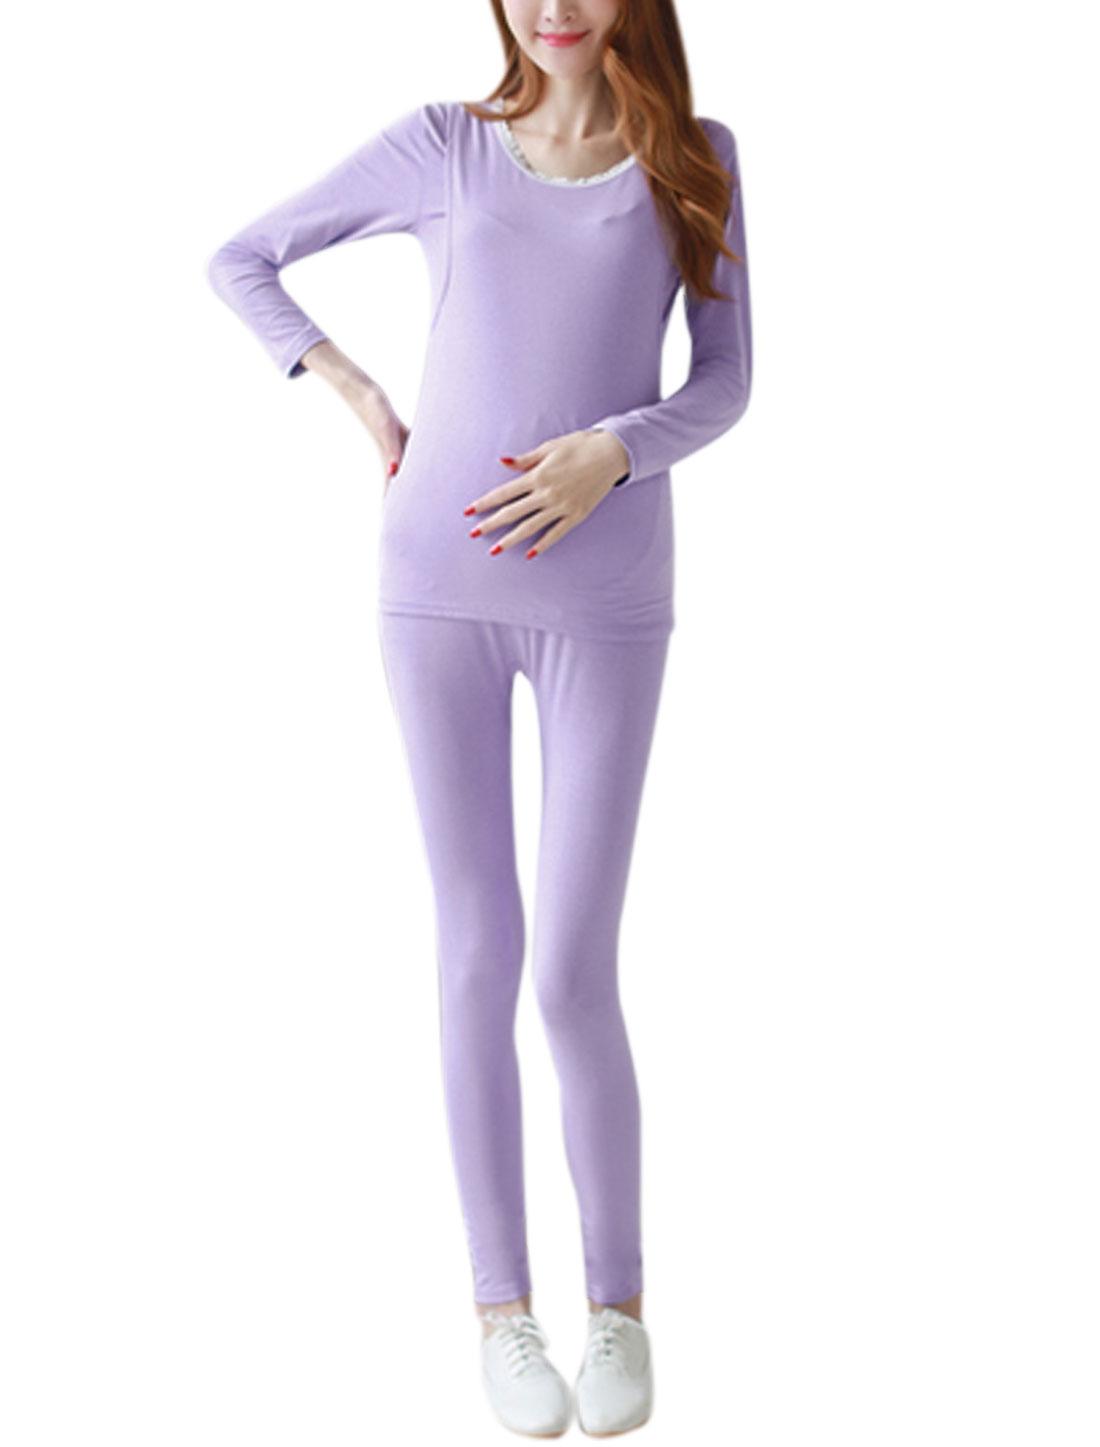 Maternity Nursing Stretchy Top w Elastic Waist Pants Pajama Set Light Purple S